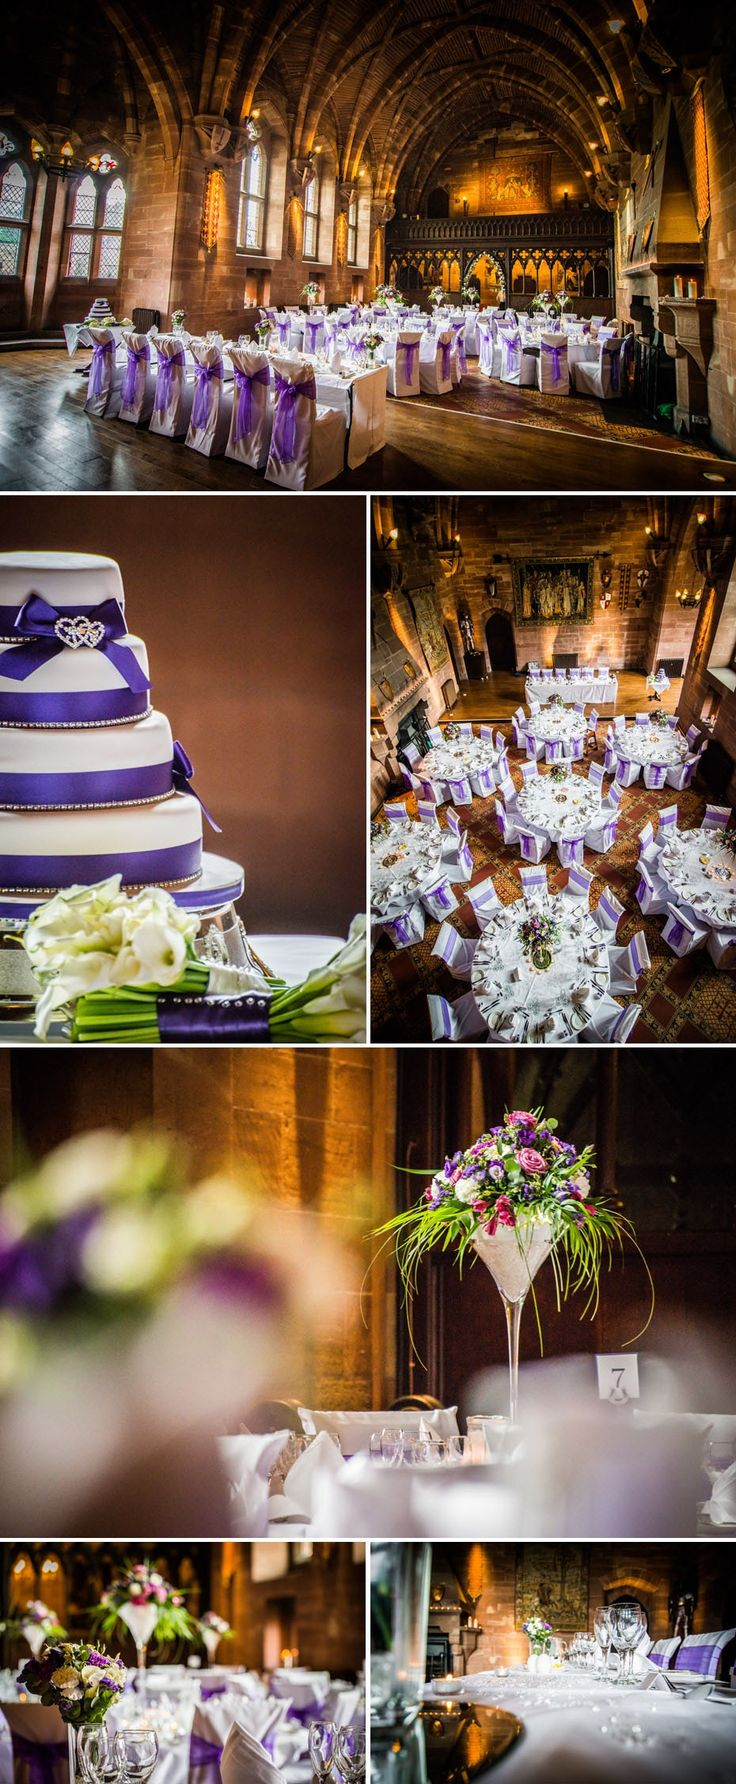 wedding venues in londonderry%0A Peckforton Castle  Cheshire Wedding Venue  purple chaire ties  venue  dressing  flowers